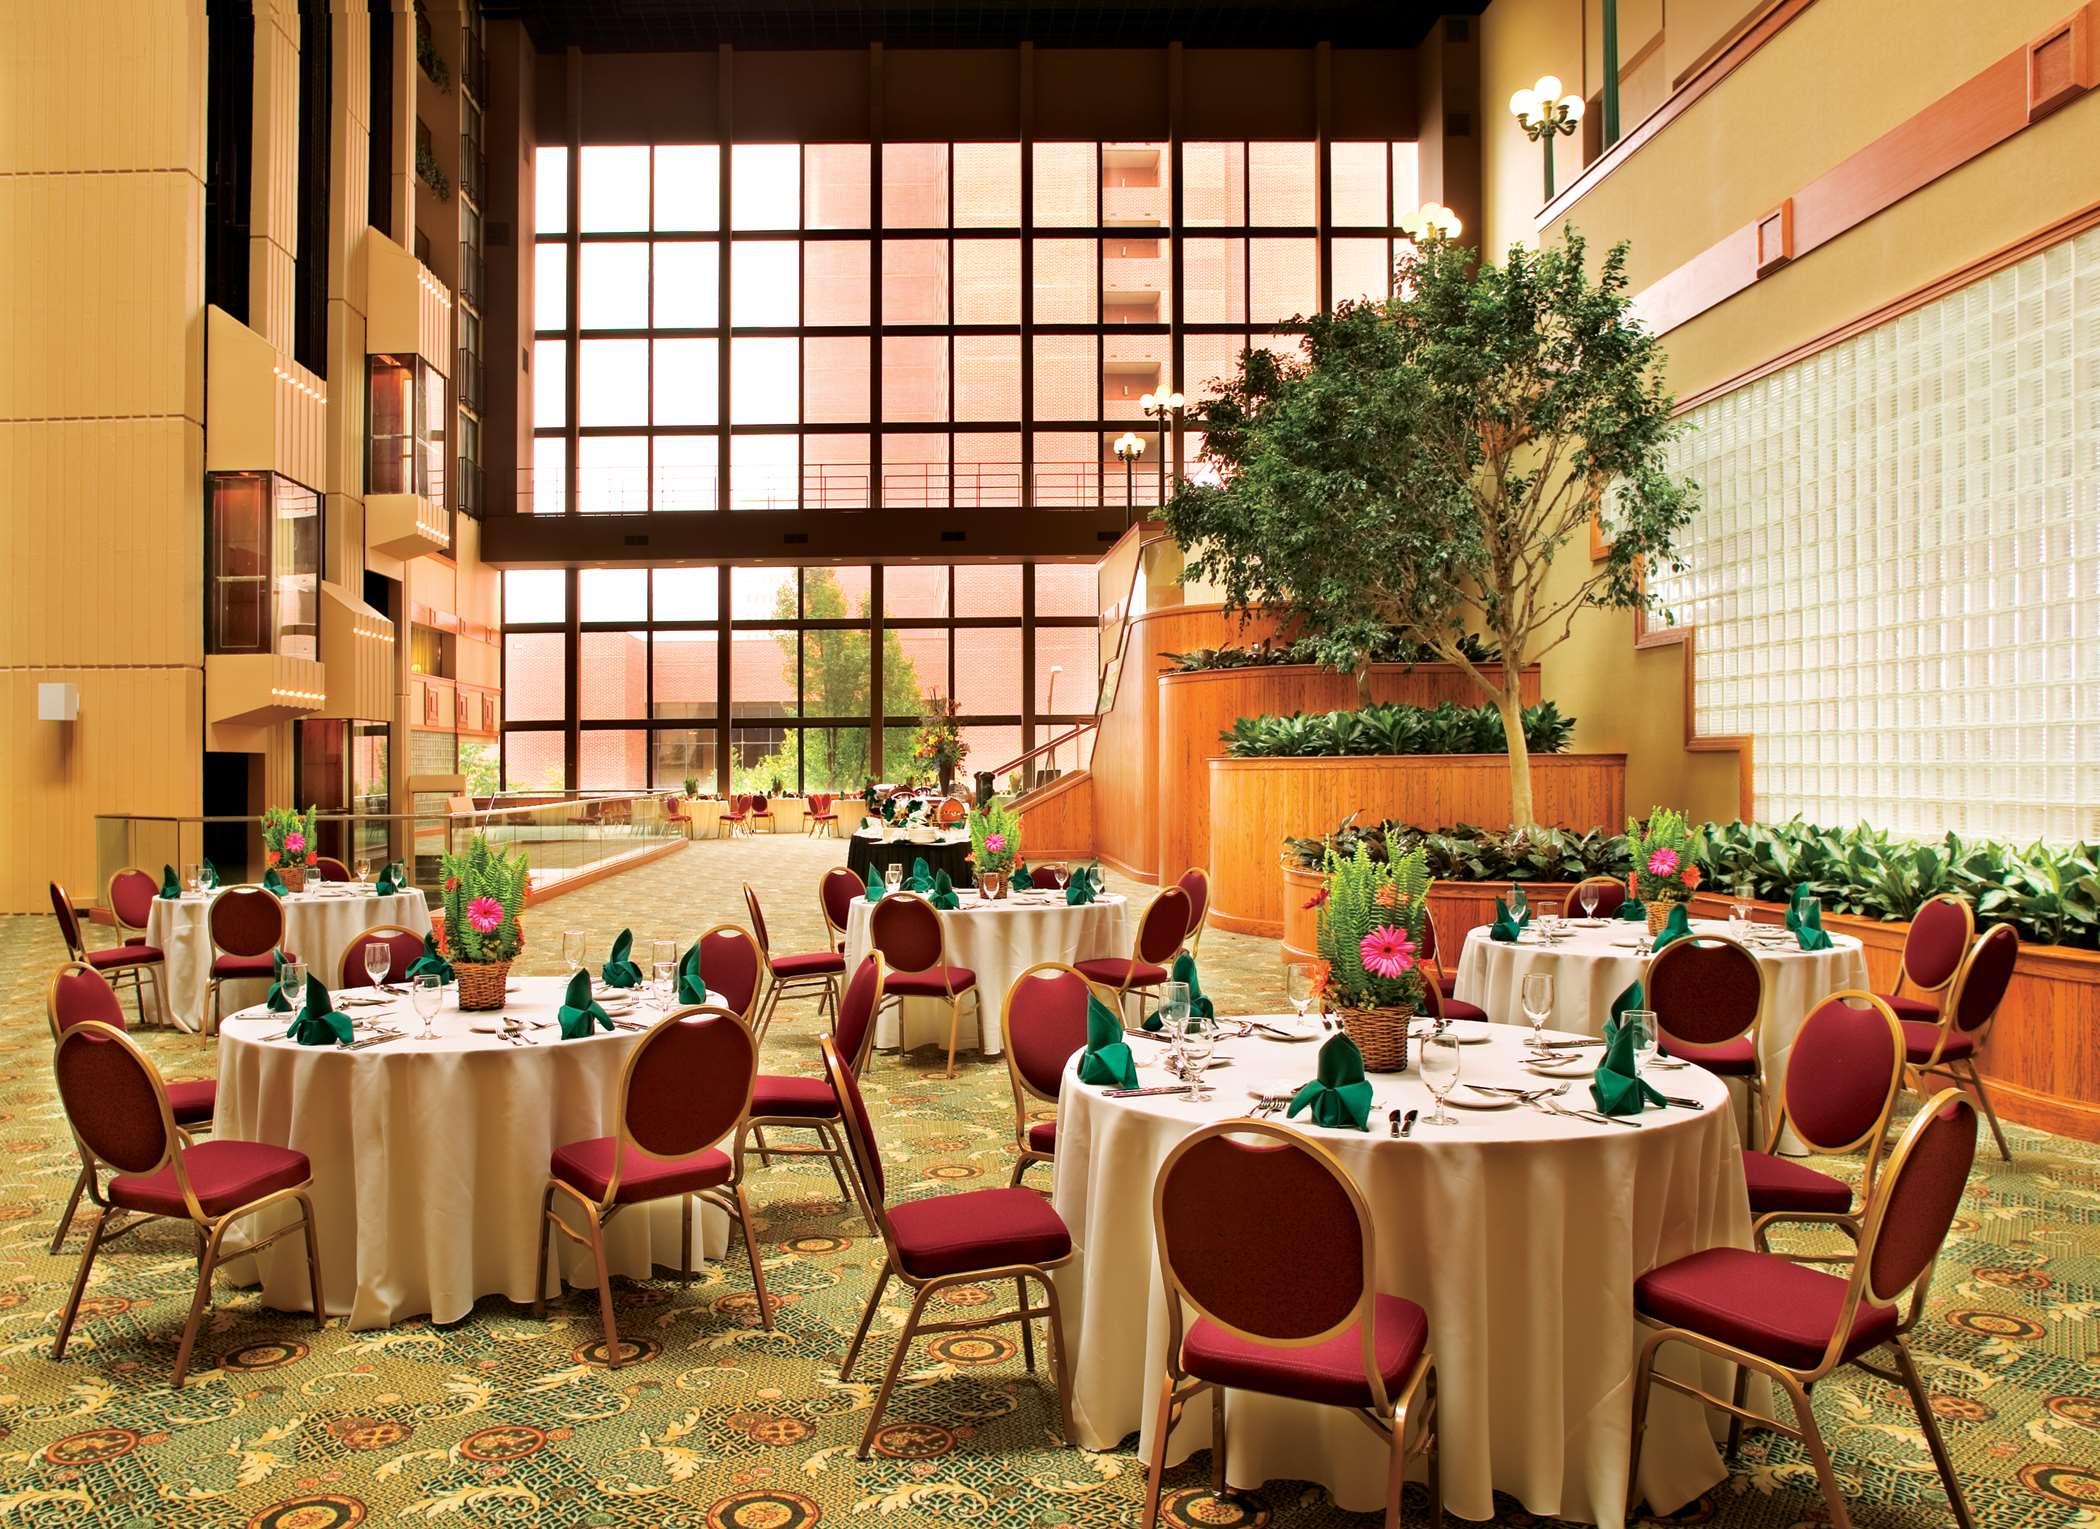 Embassy Suites by Hilton Winston Salem image 4